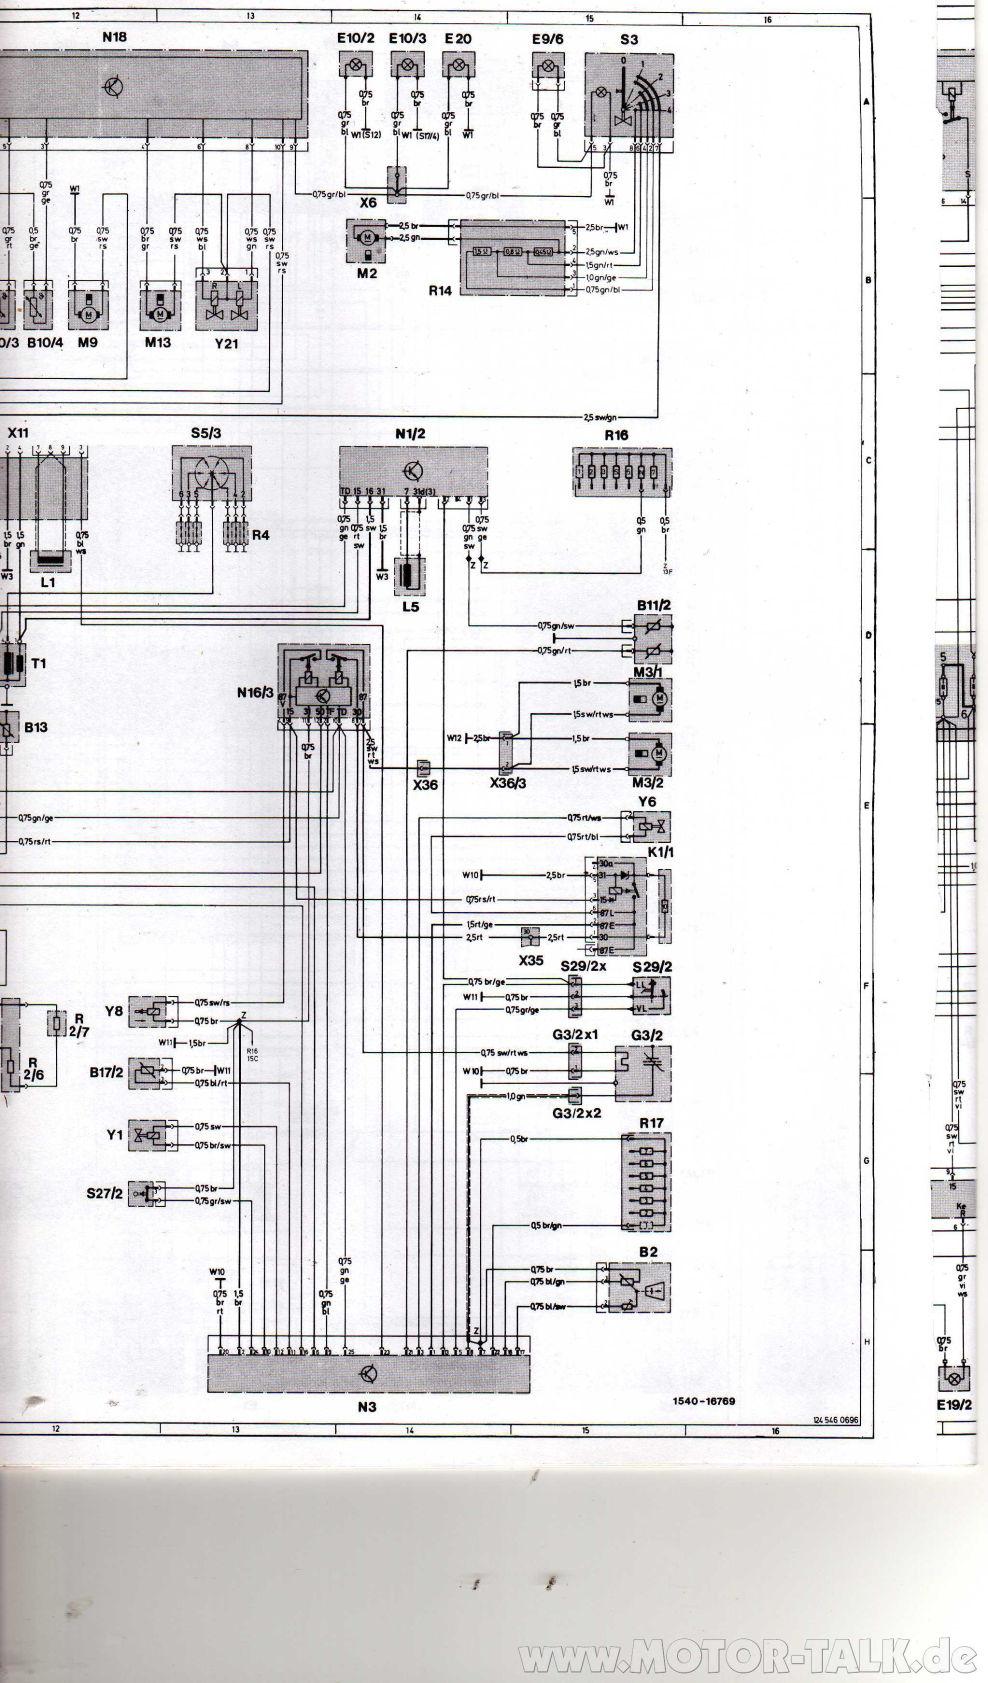 w124 schaltplan m103 5 kabelplan m103 gesucht mercedes. Black Bedroom Furniture Sets. Home Design Ideas